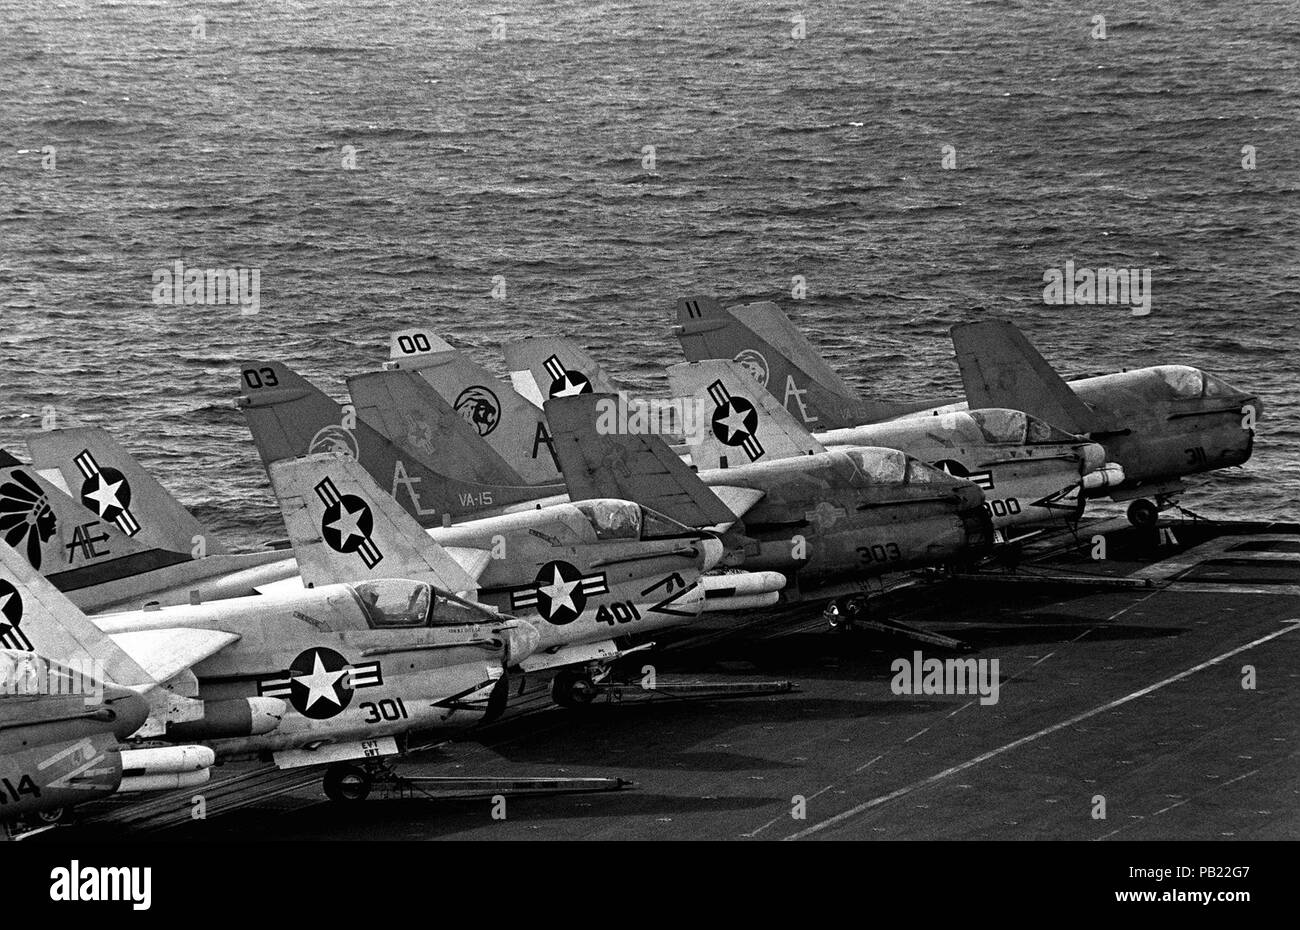 A7E CV62 1983  A-7E Corsair II aircraft line the flight deck of the